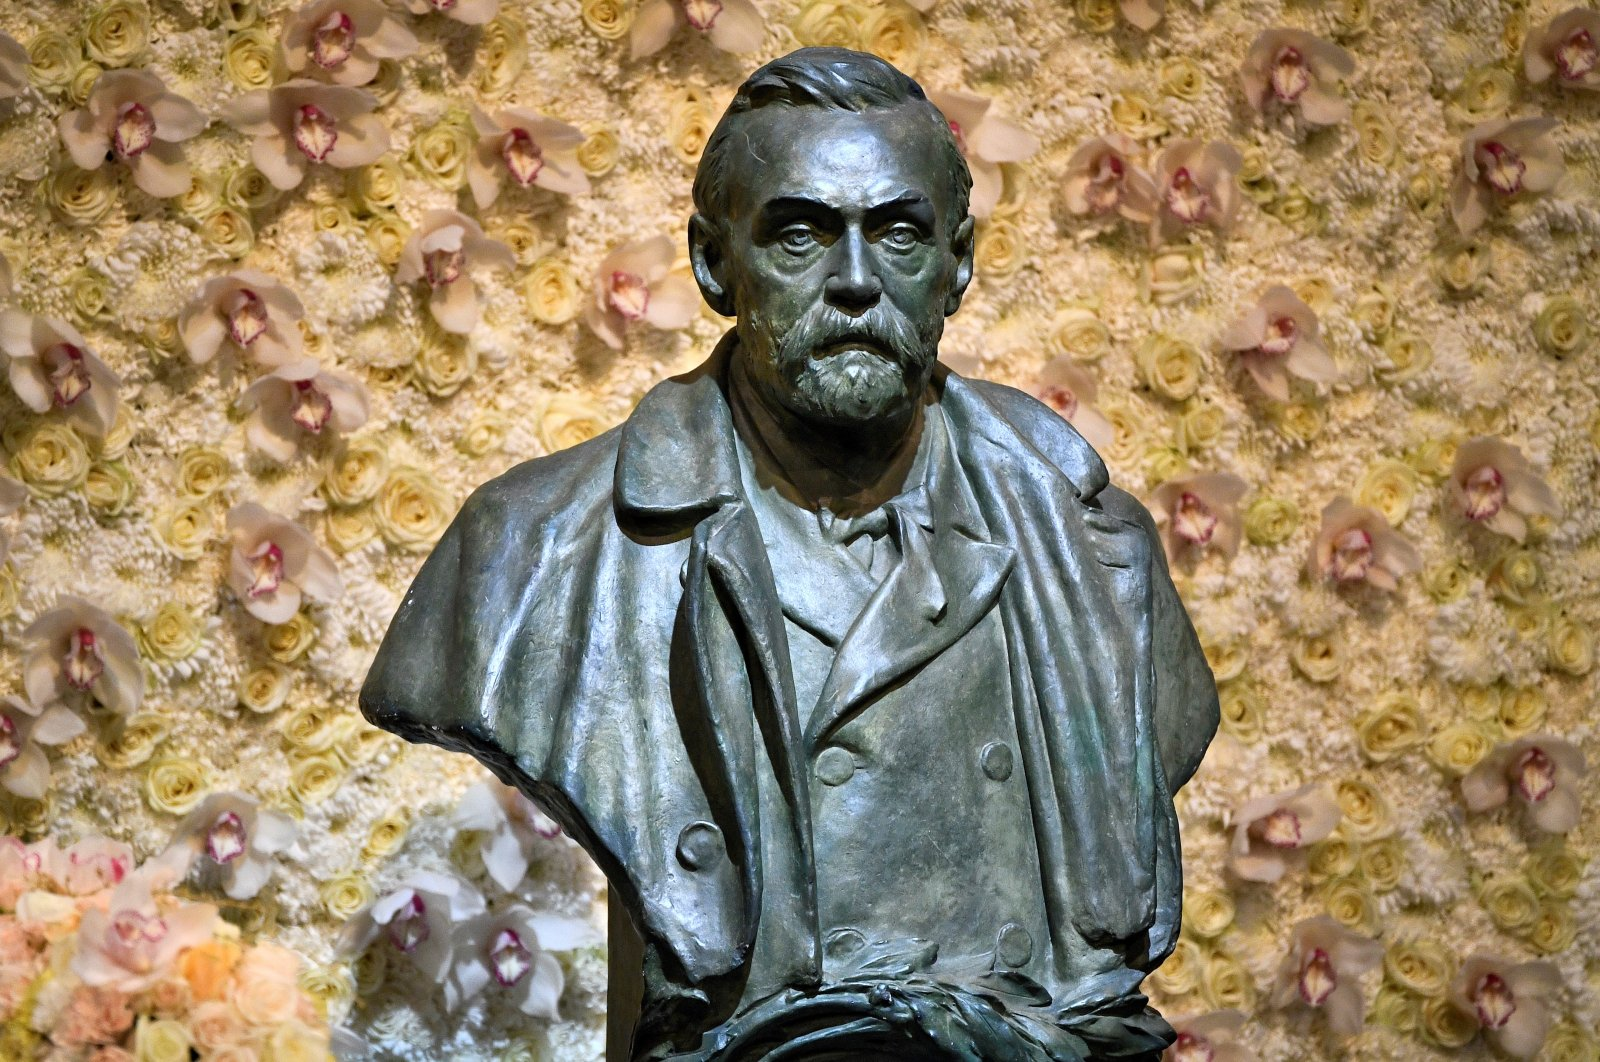 A bronze bust of Alfred Nobel is pictured before the Nobel Prize ceremony at Stockholm Concert Hall, in Stockholm, Sweden Dec. 10, 2019. (Reuters Photo)